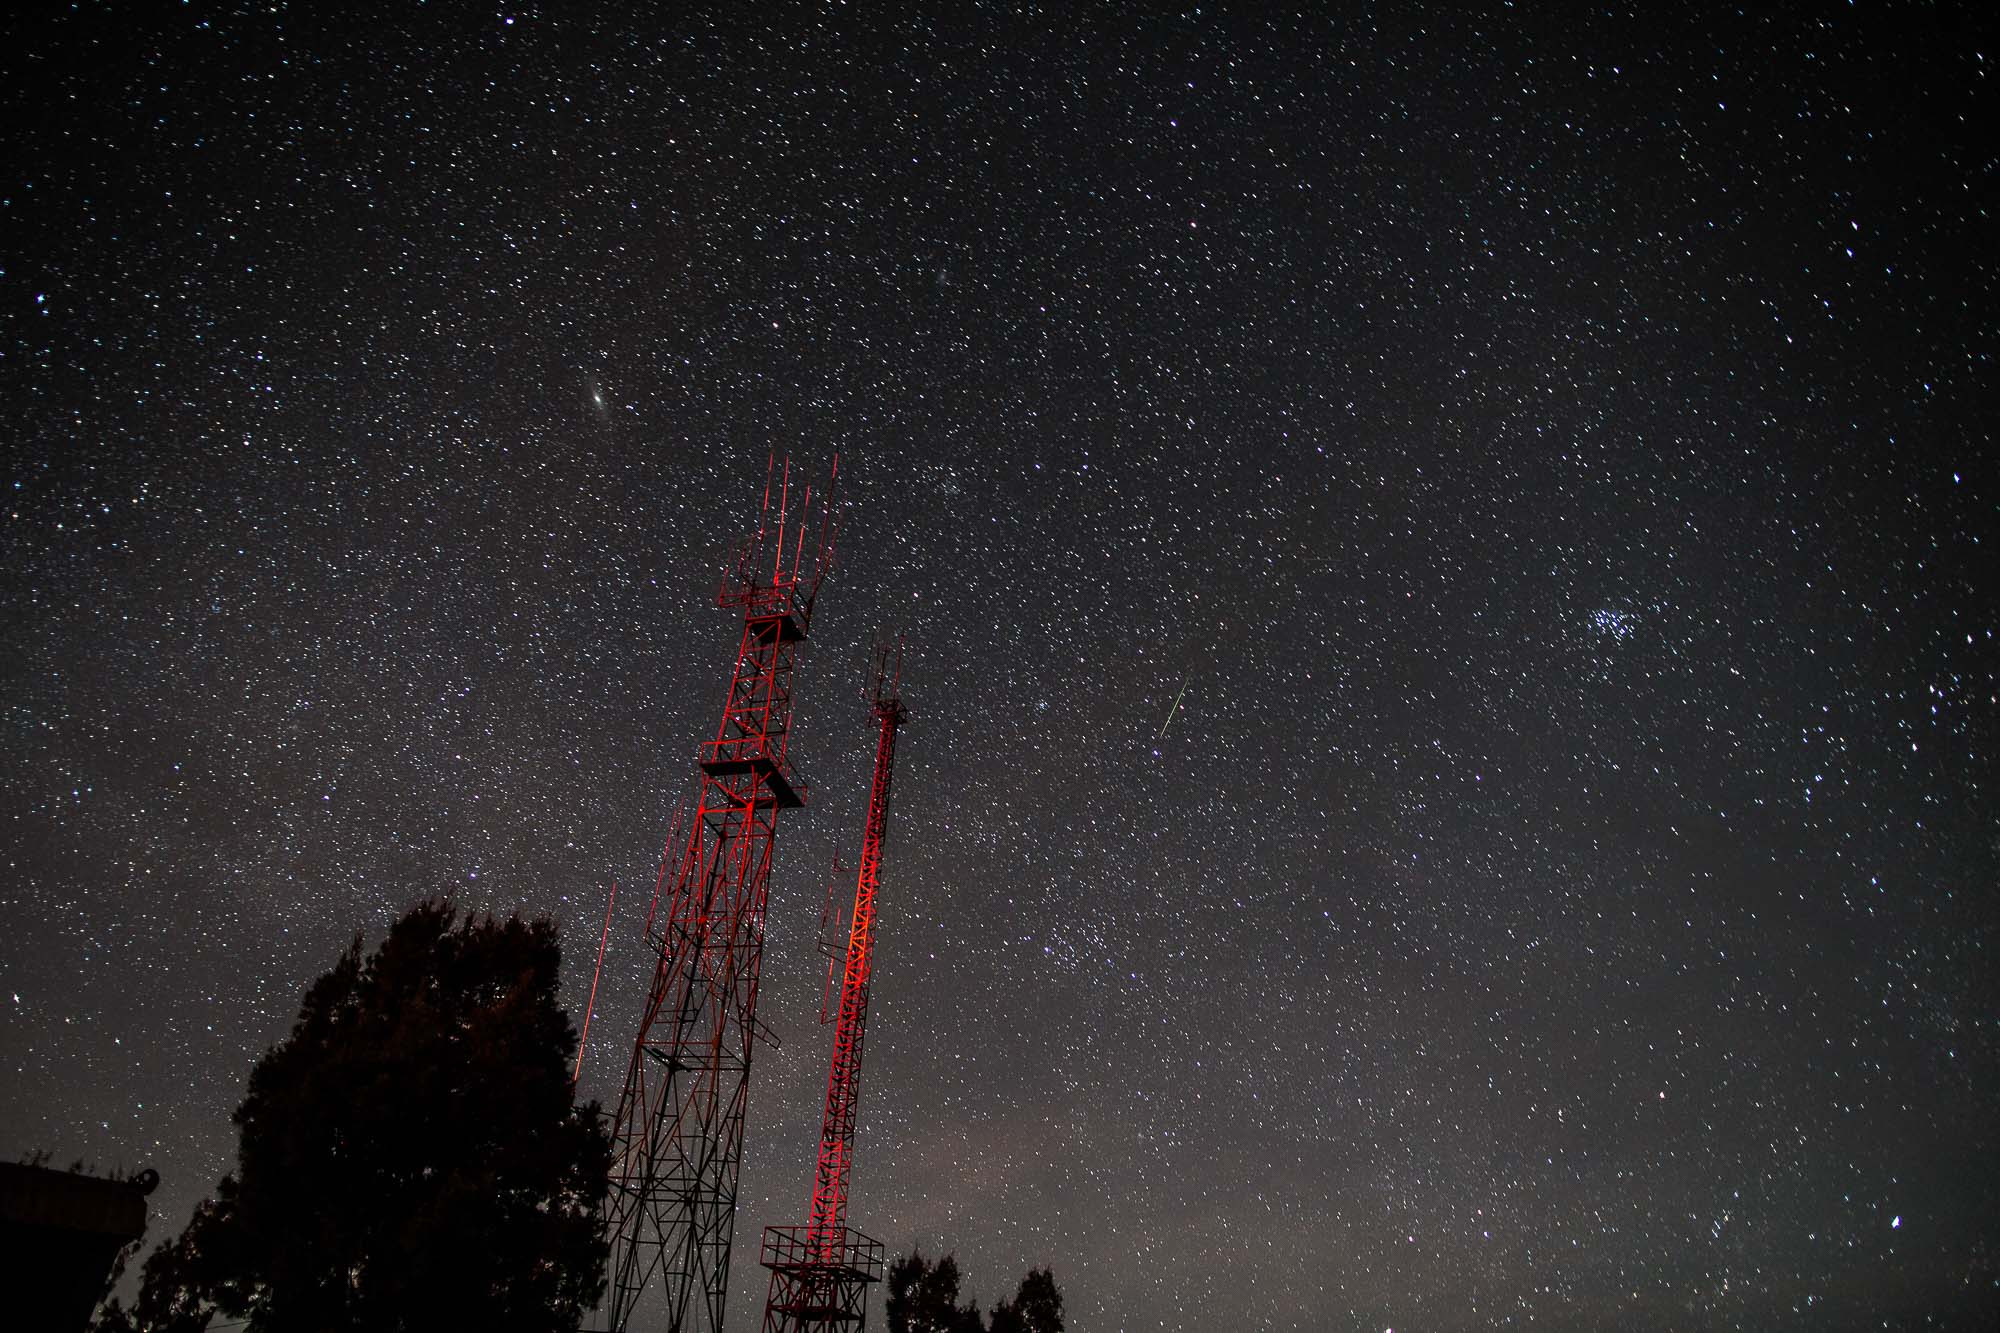 Night sky over Java at night - Jus Medic